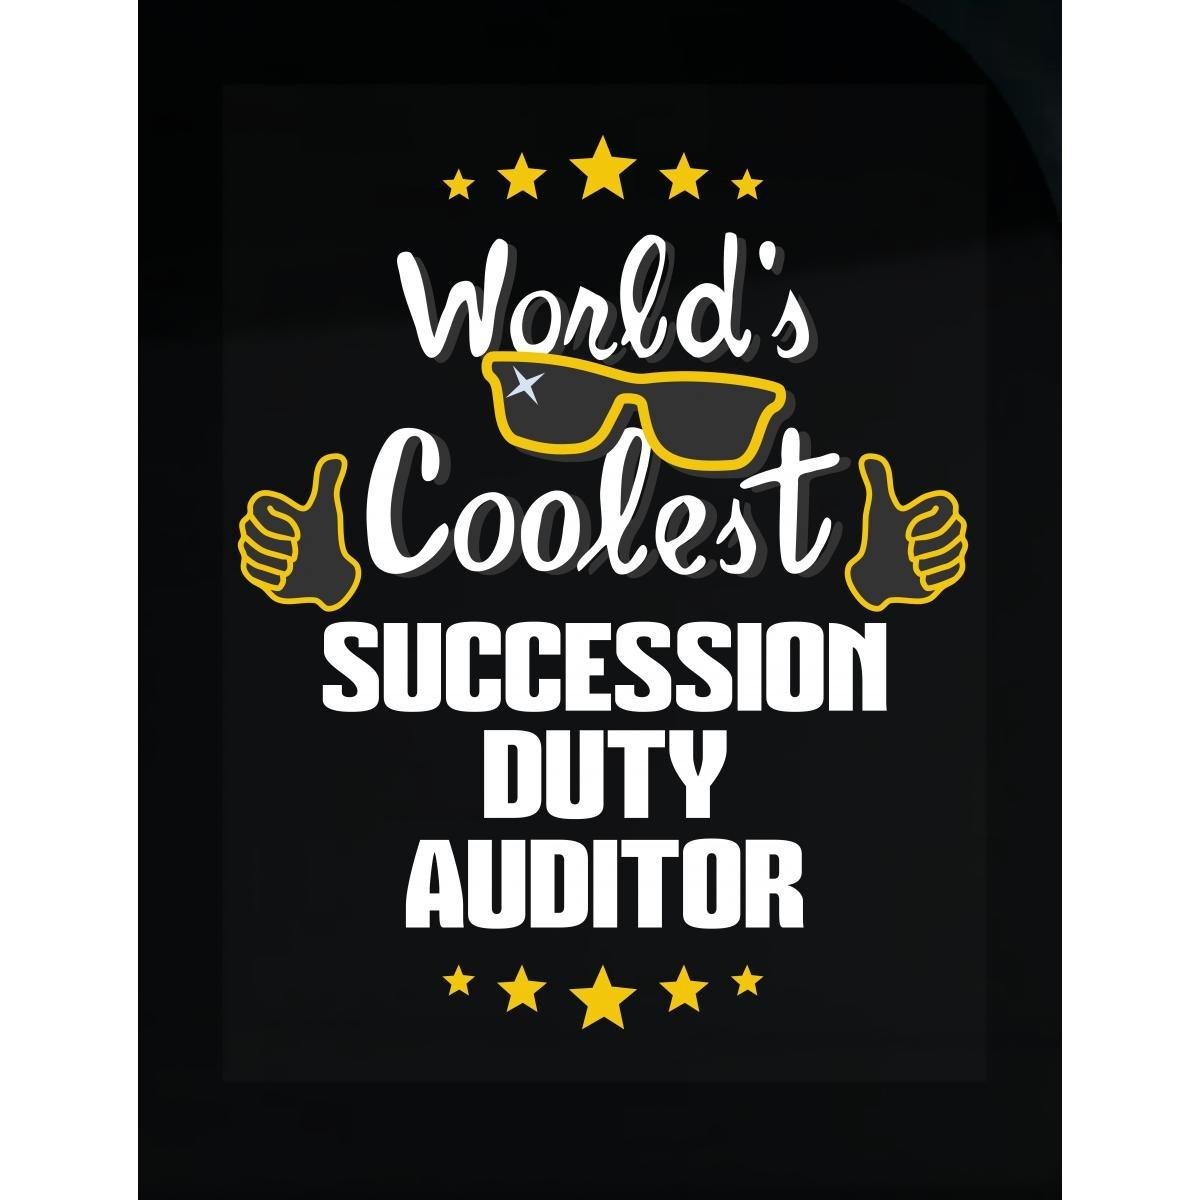 World's Coolest Succession Duty Auditor - Sticker